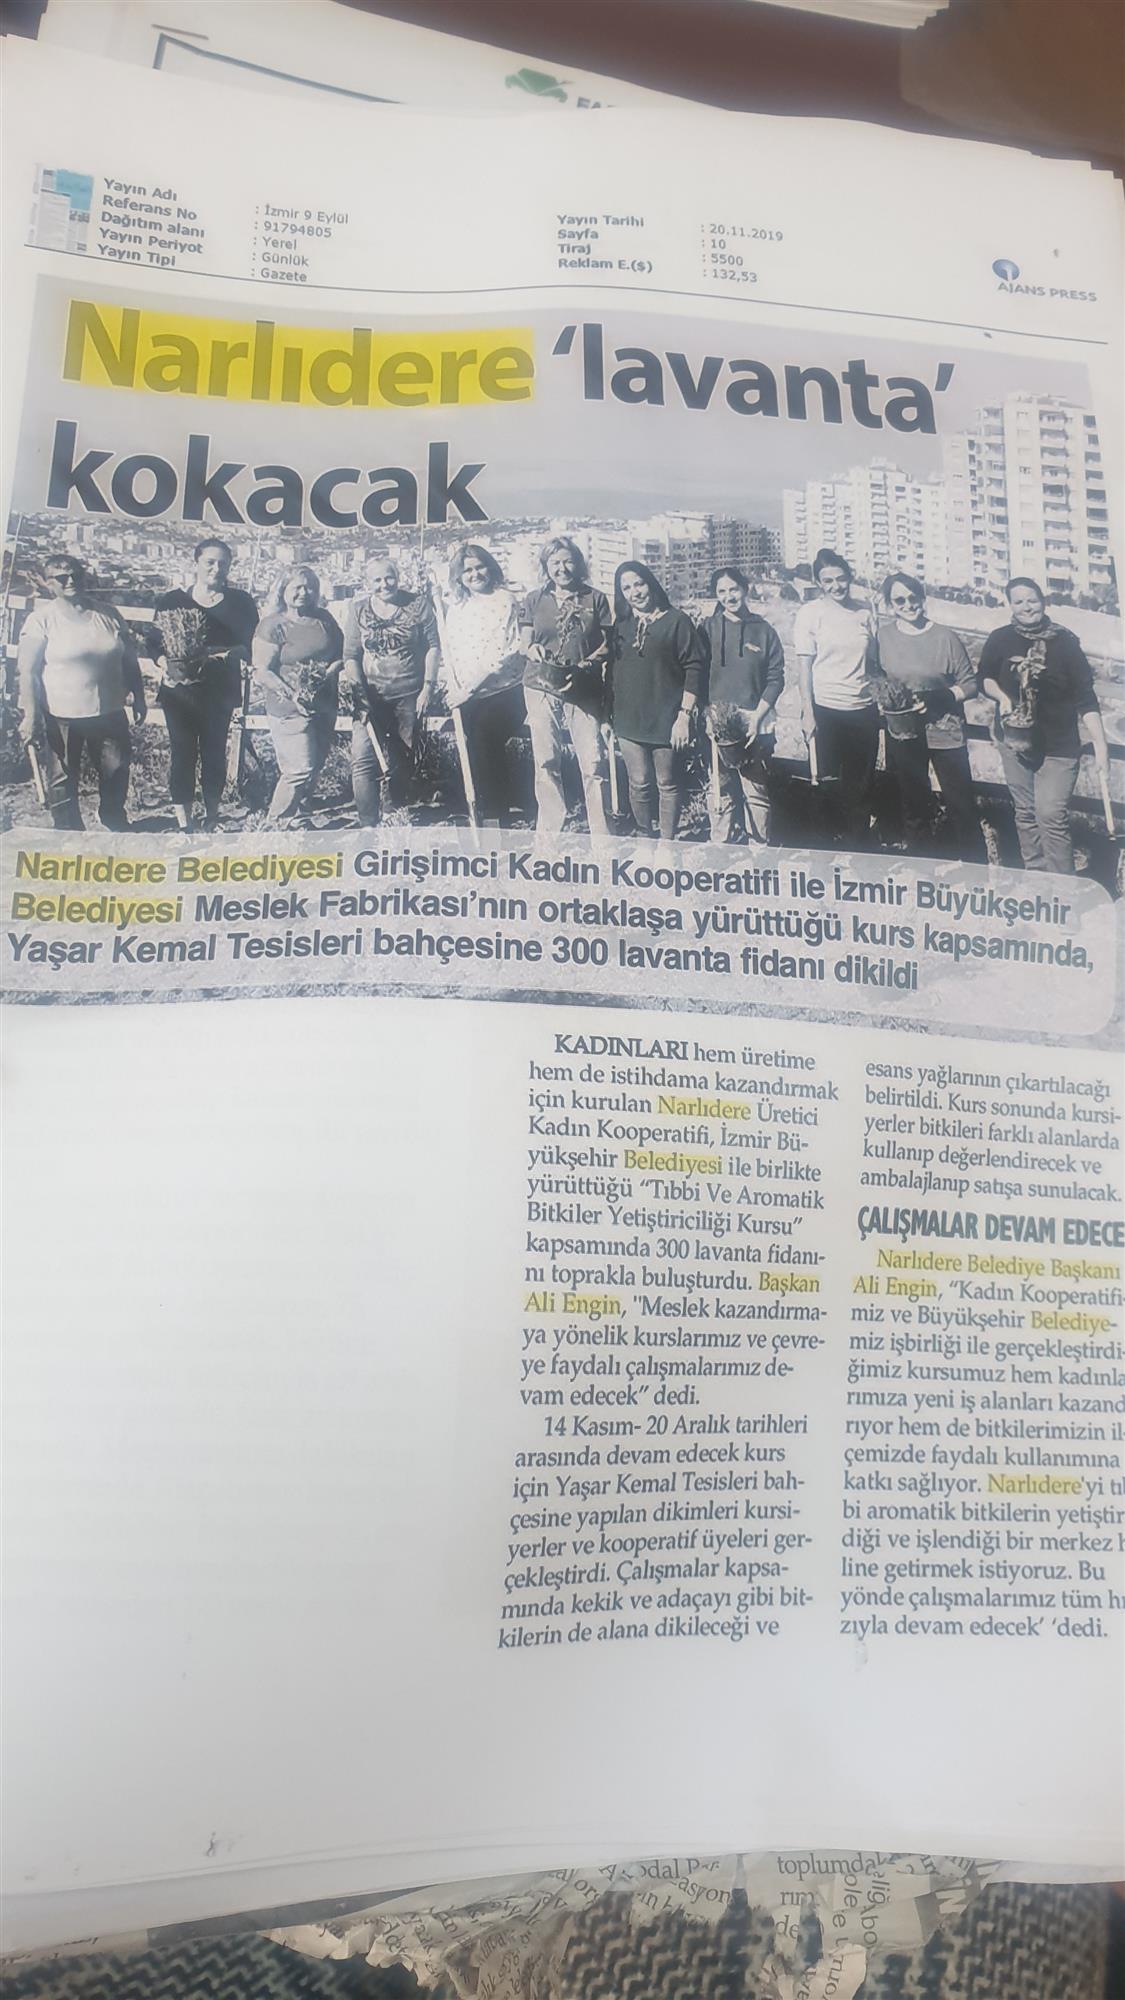 gazete-haberleri202012816627778